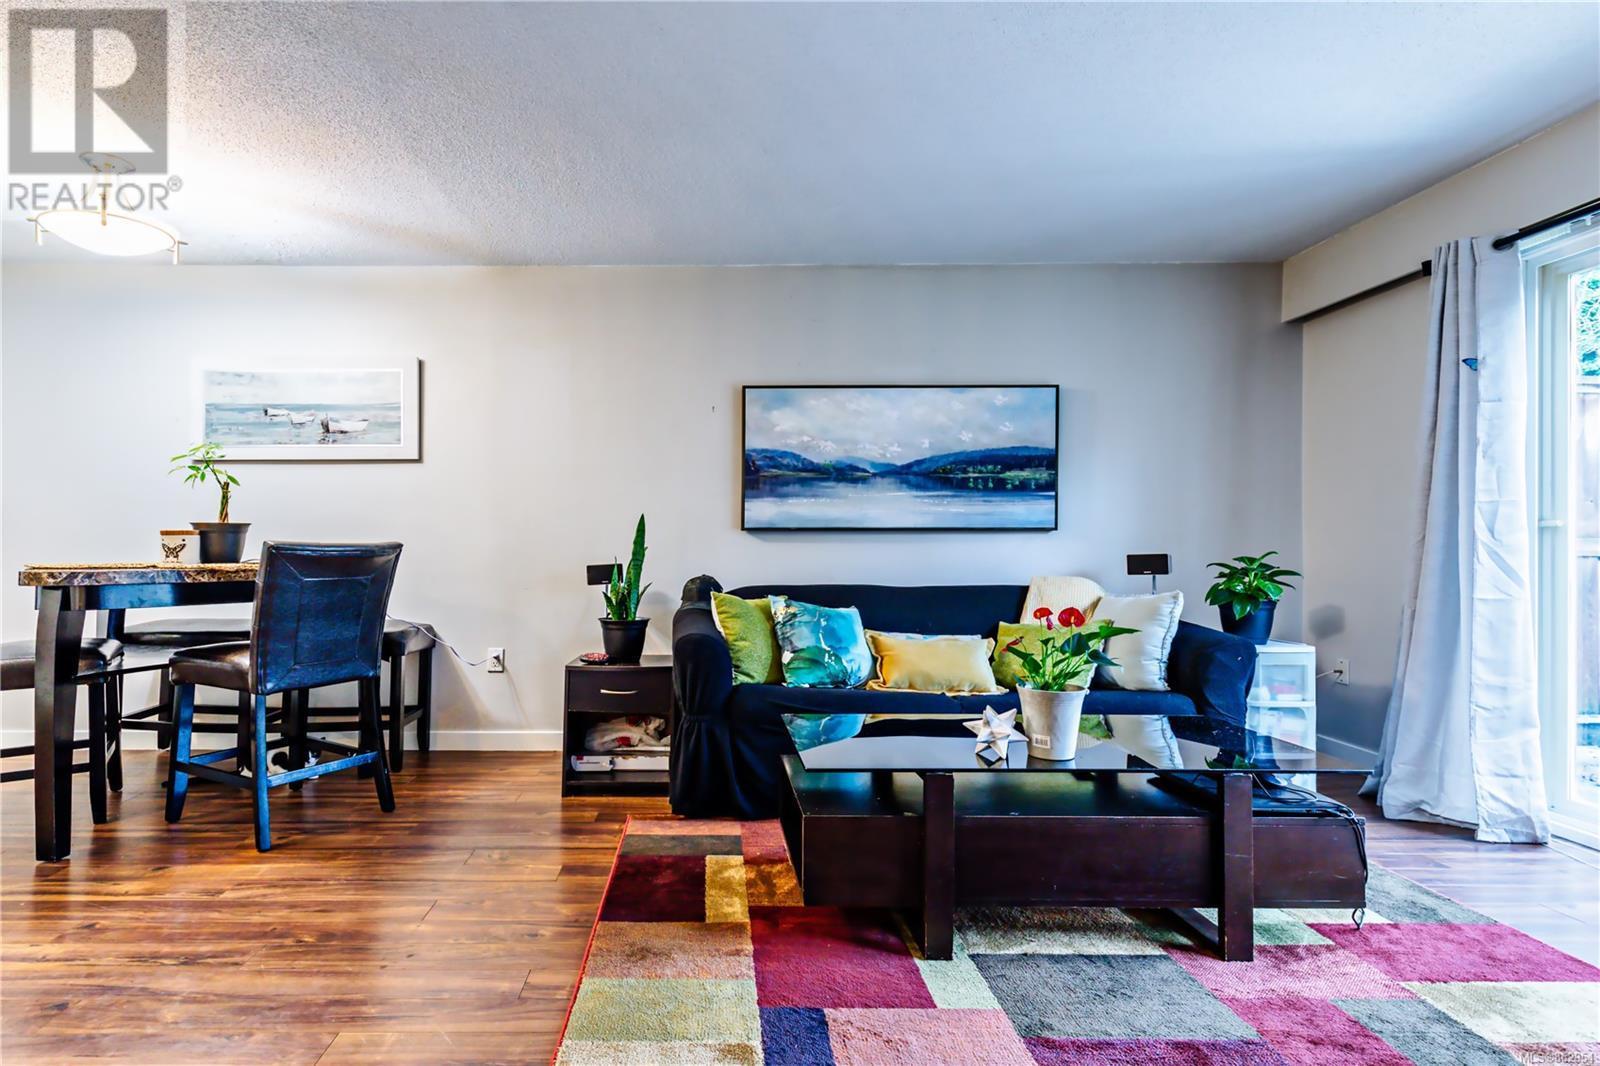 2552 Highland Blvd, Nanaimo, British Columbia  V9S 3N8 - Photo 15 - 862954